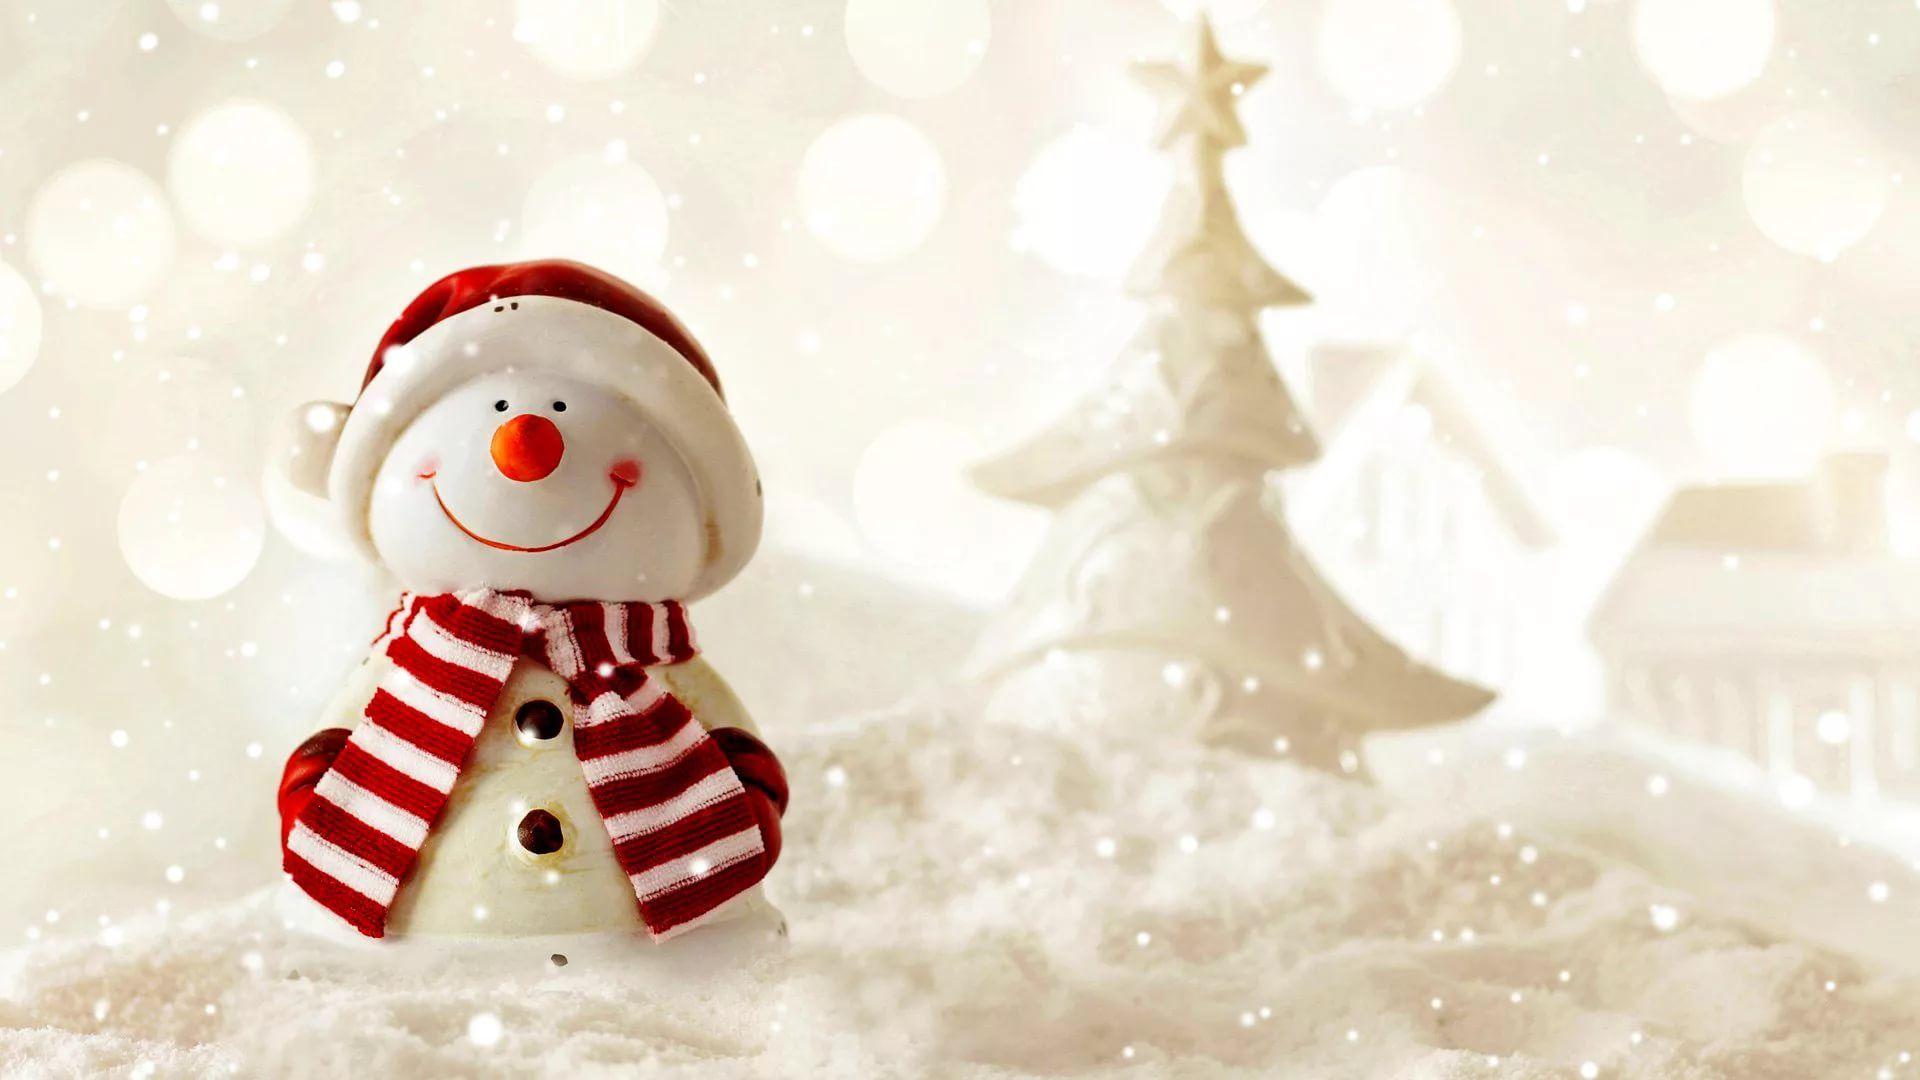 Cute Winter Wallpaper Image